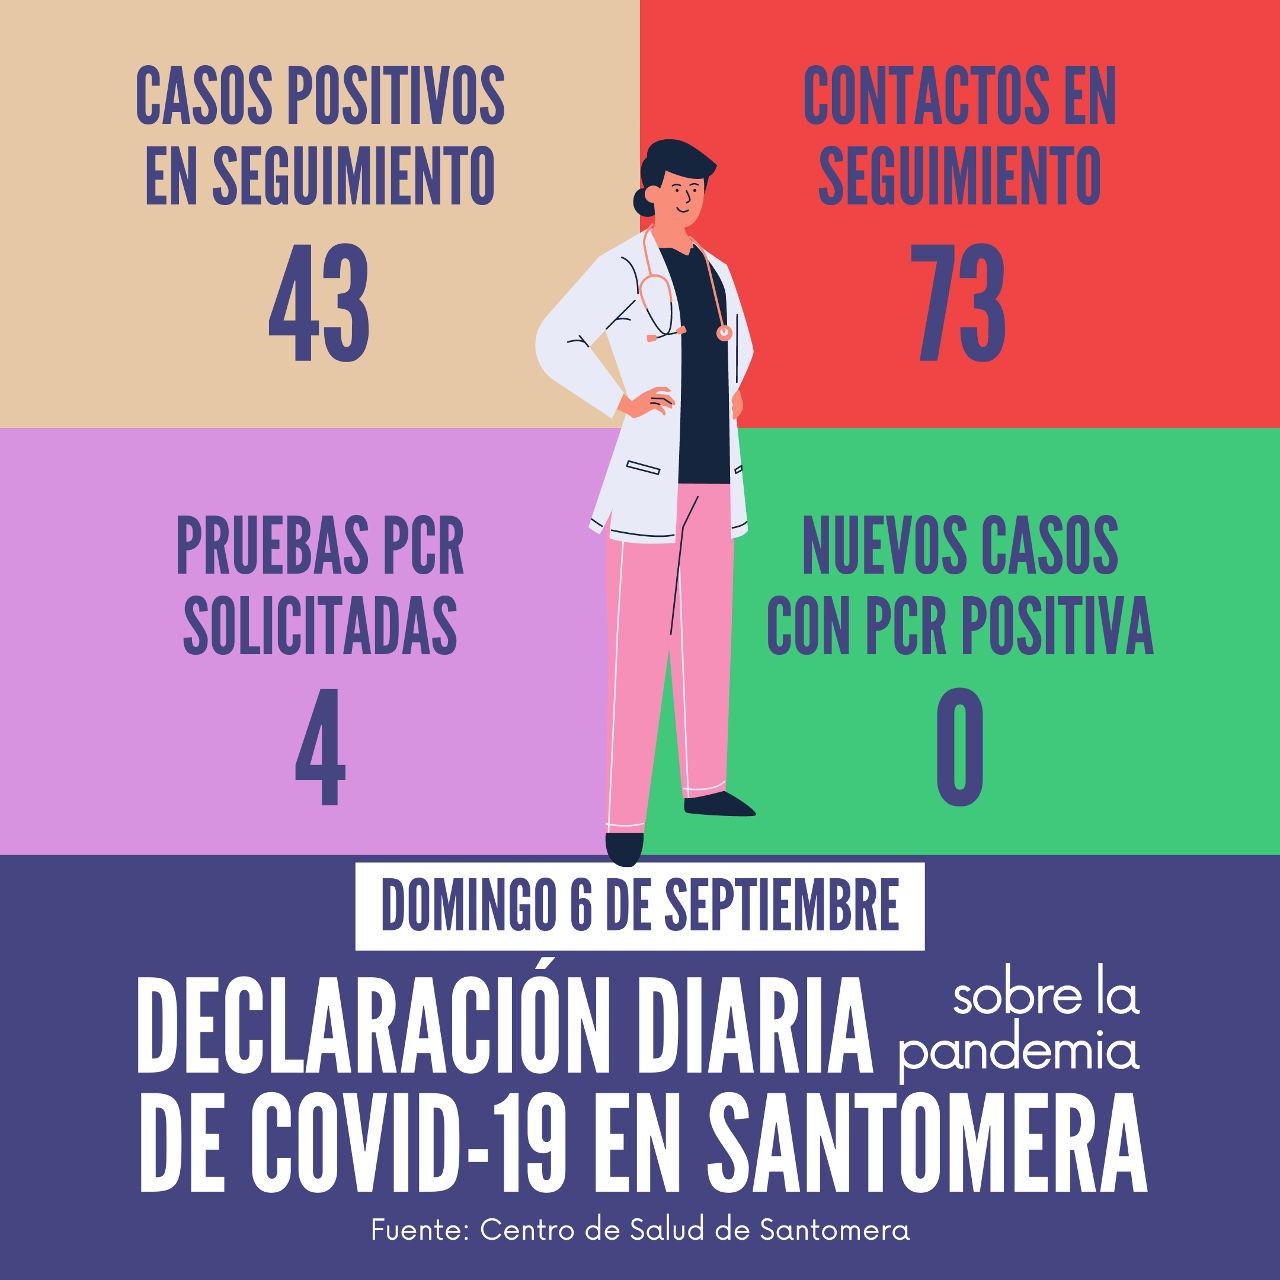 20200906_Datos COVID-19 Santomera